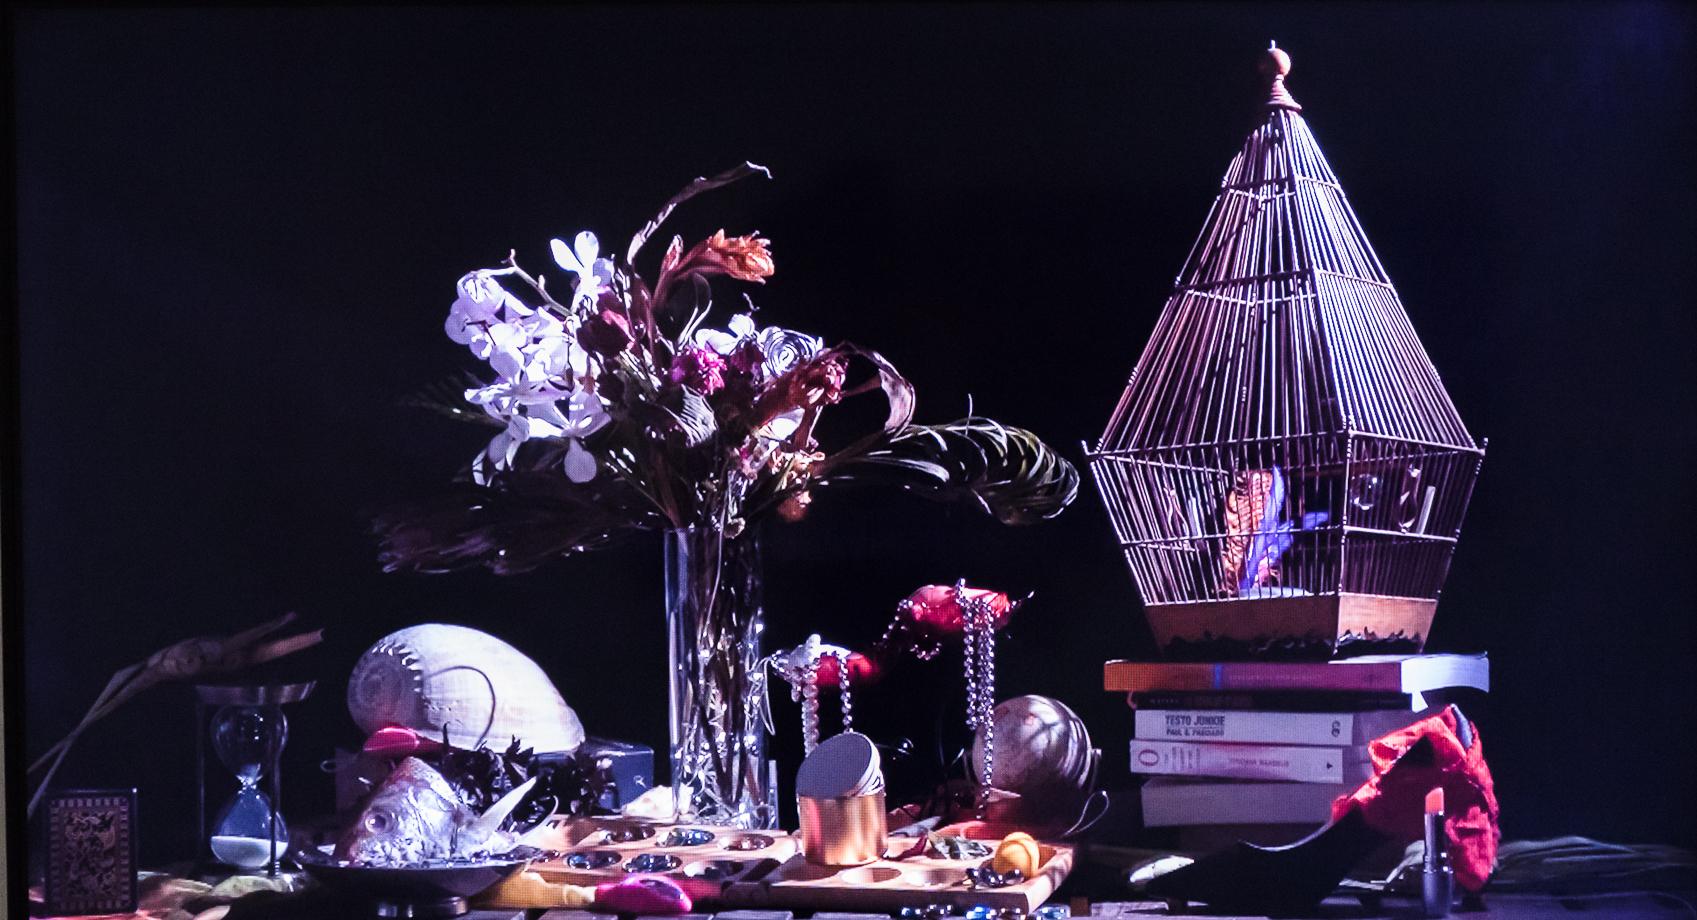 Dipali Gupta,  The Little Death  (2018), Digital video, 16:9 aspect ratio, colour.